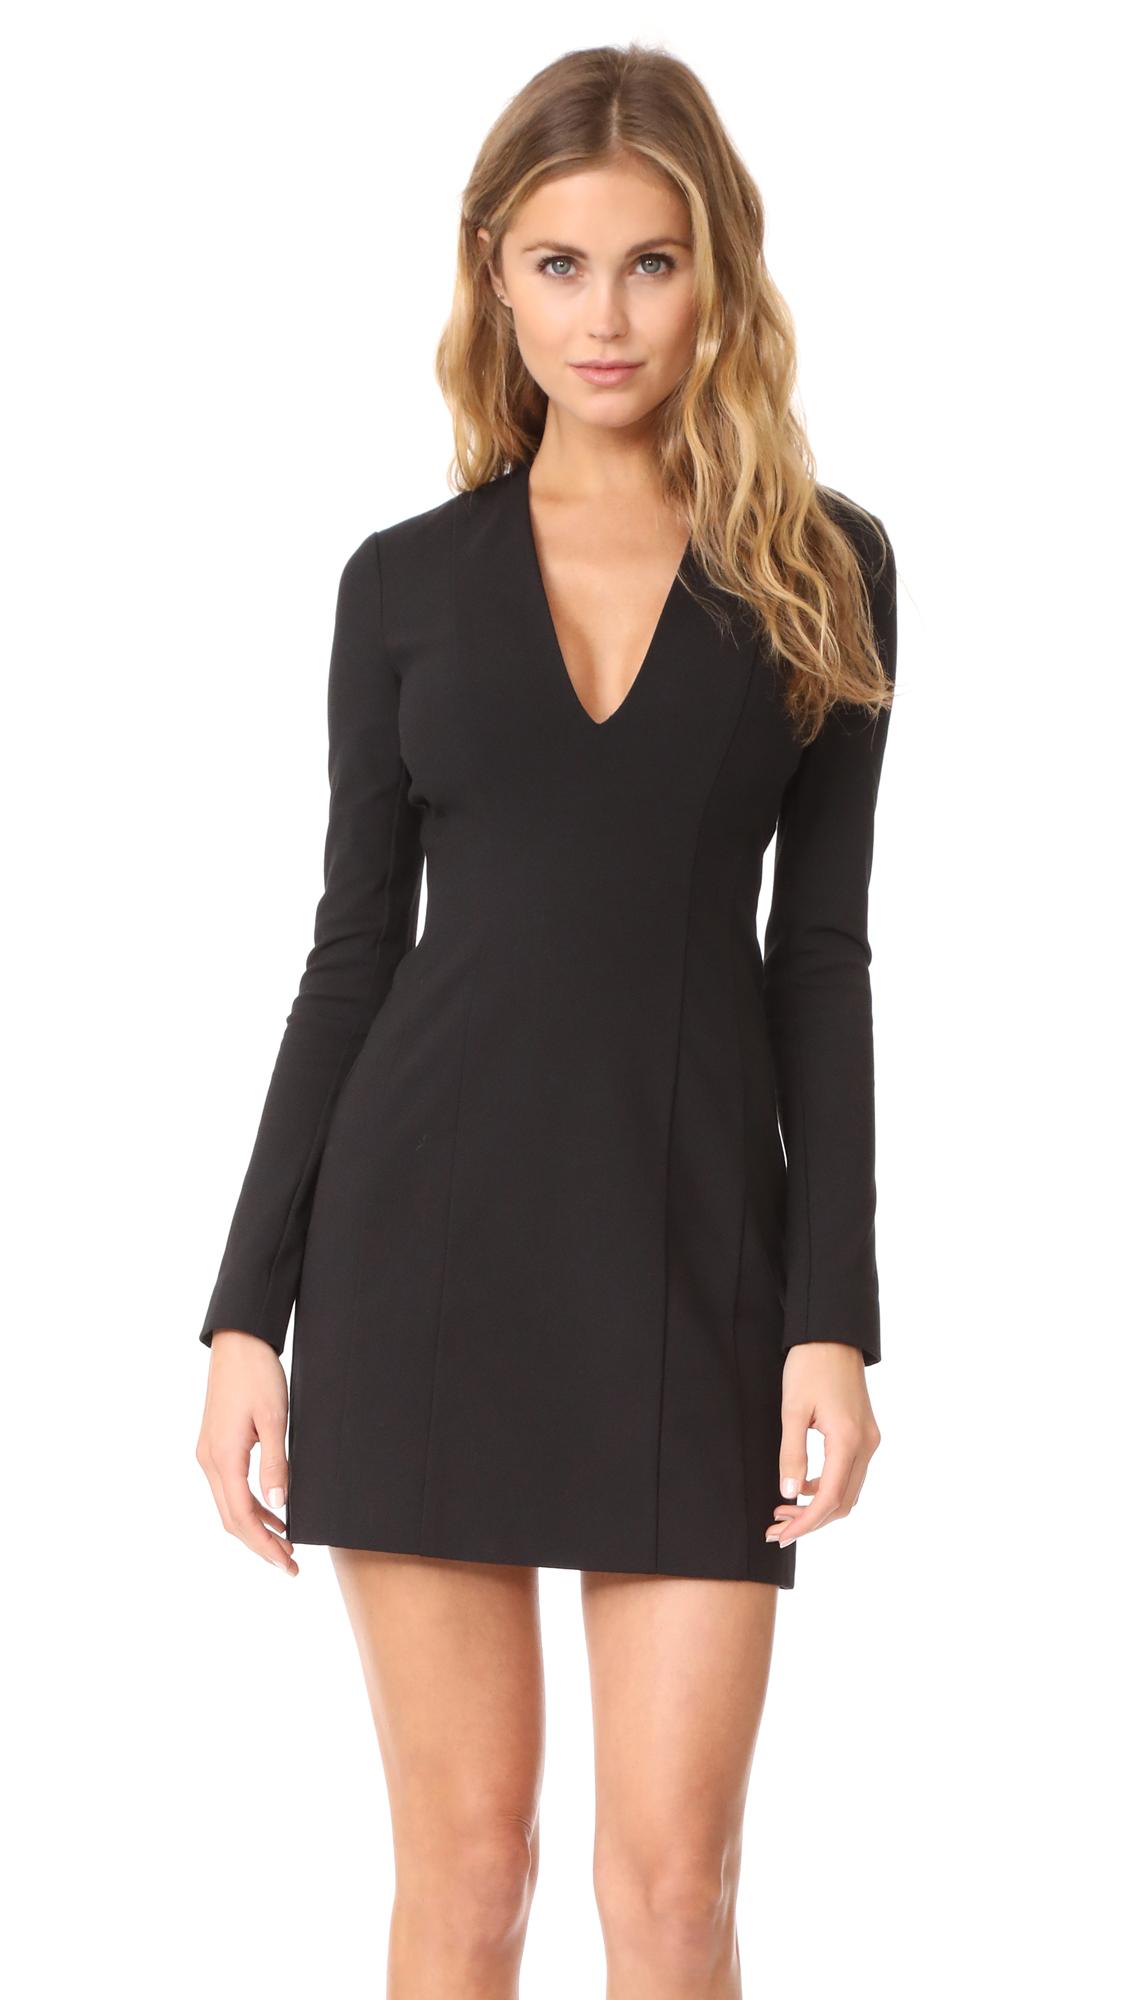 Theory V Neck Mini Dress - Black